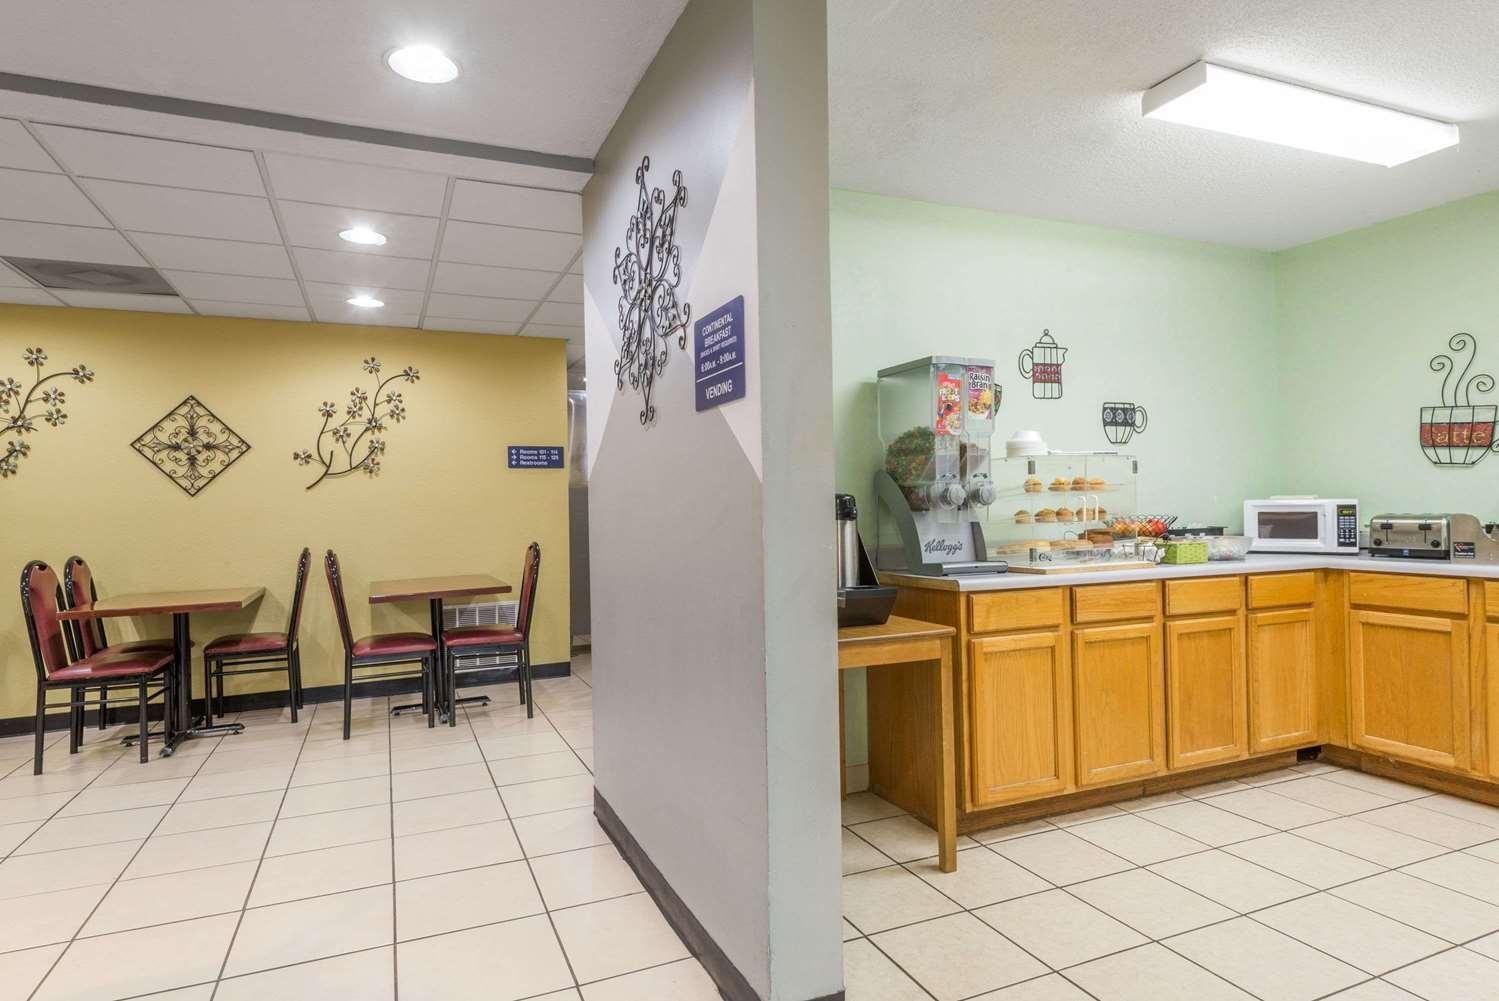 proam - Microtel Inn & Suites by Wyndham Riverside